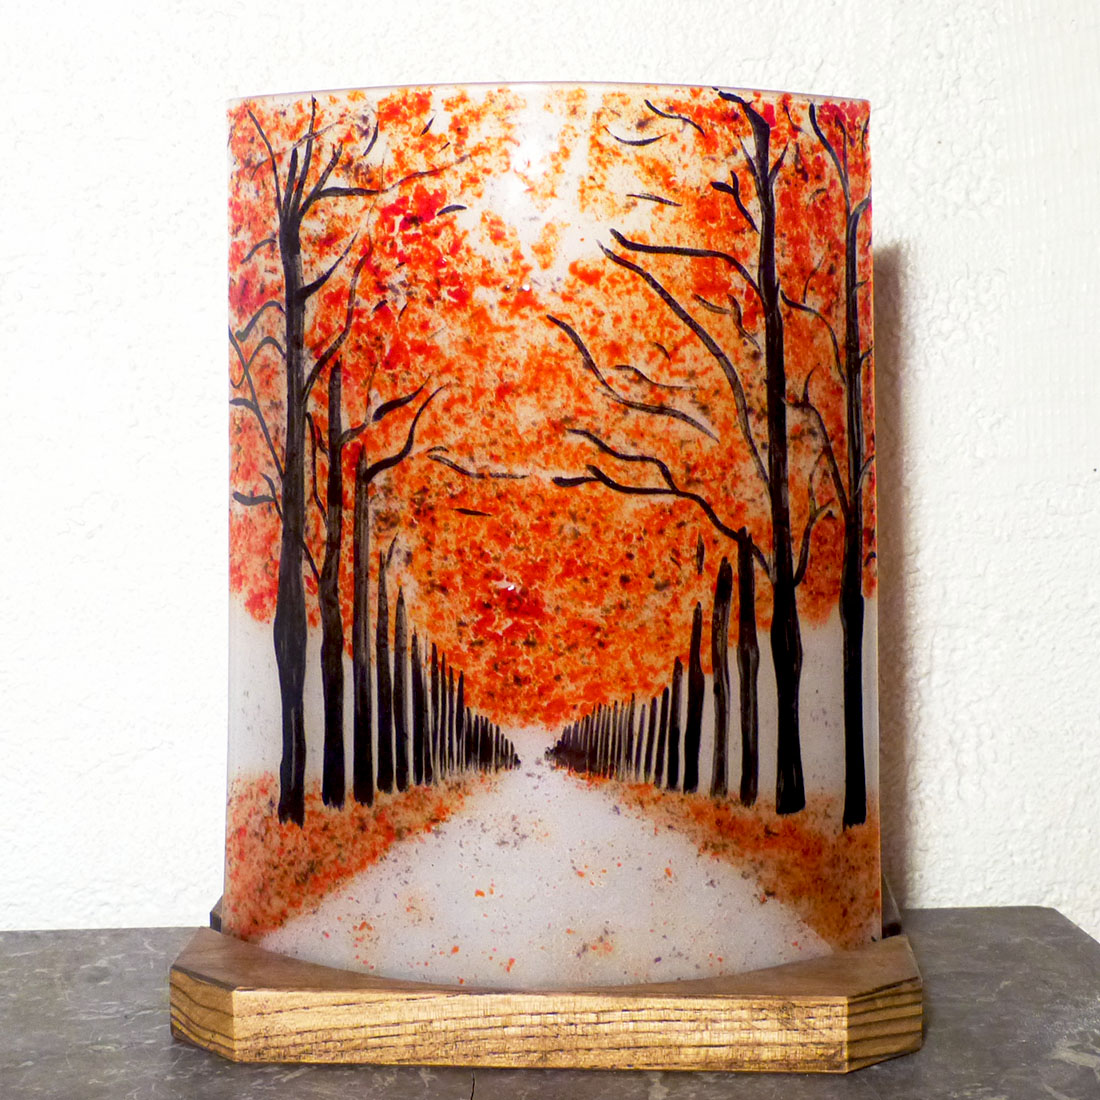 Lampe artisanale une allee d arbres rouge